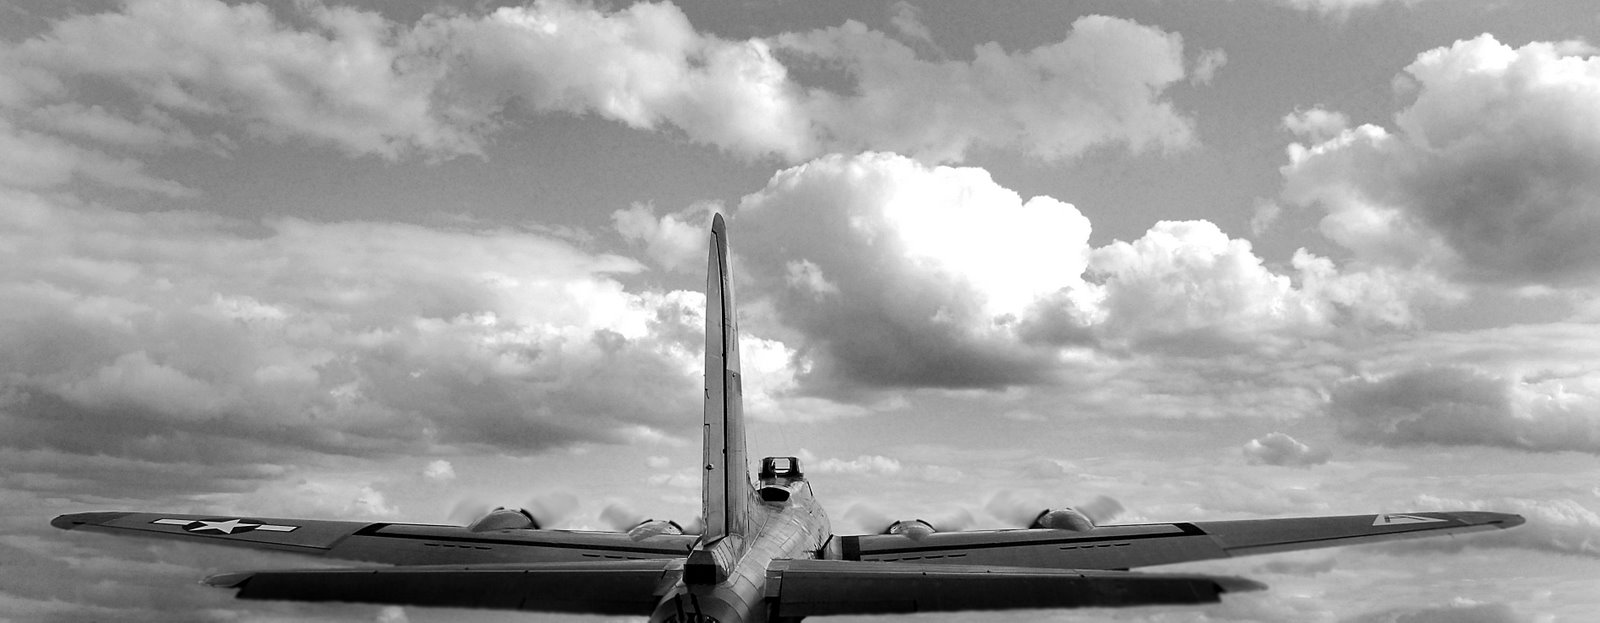 [B-17+michael+Joyce]